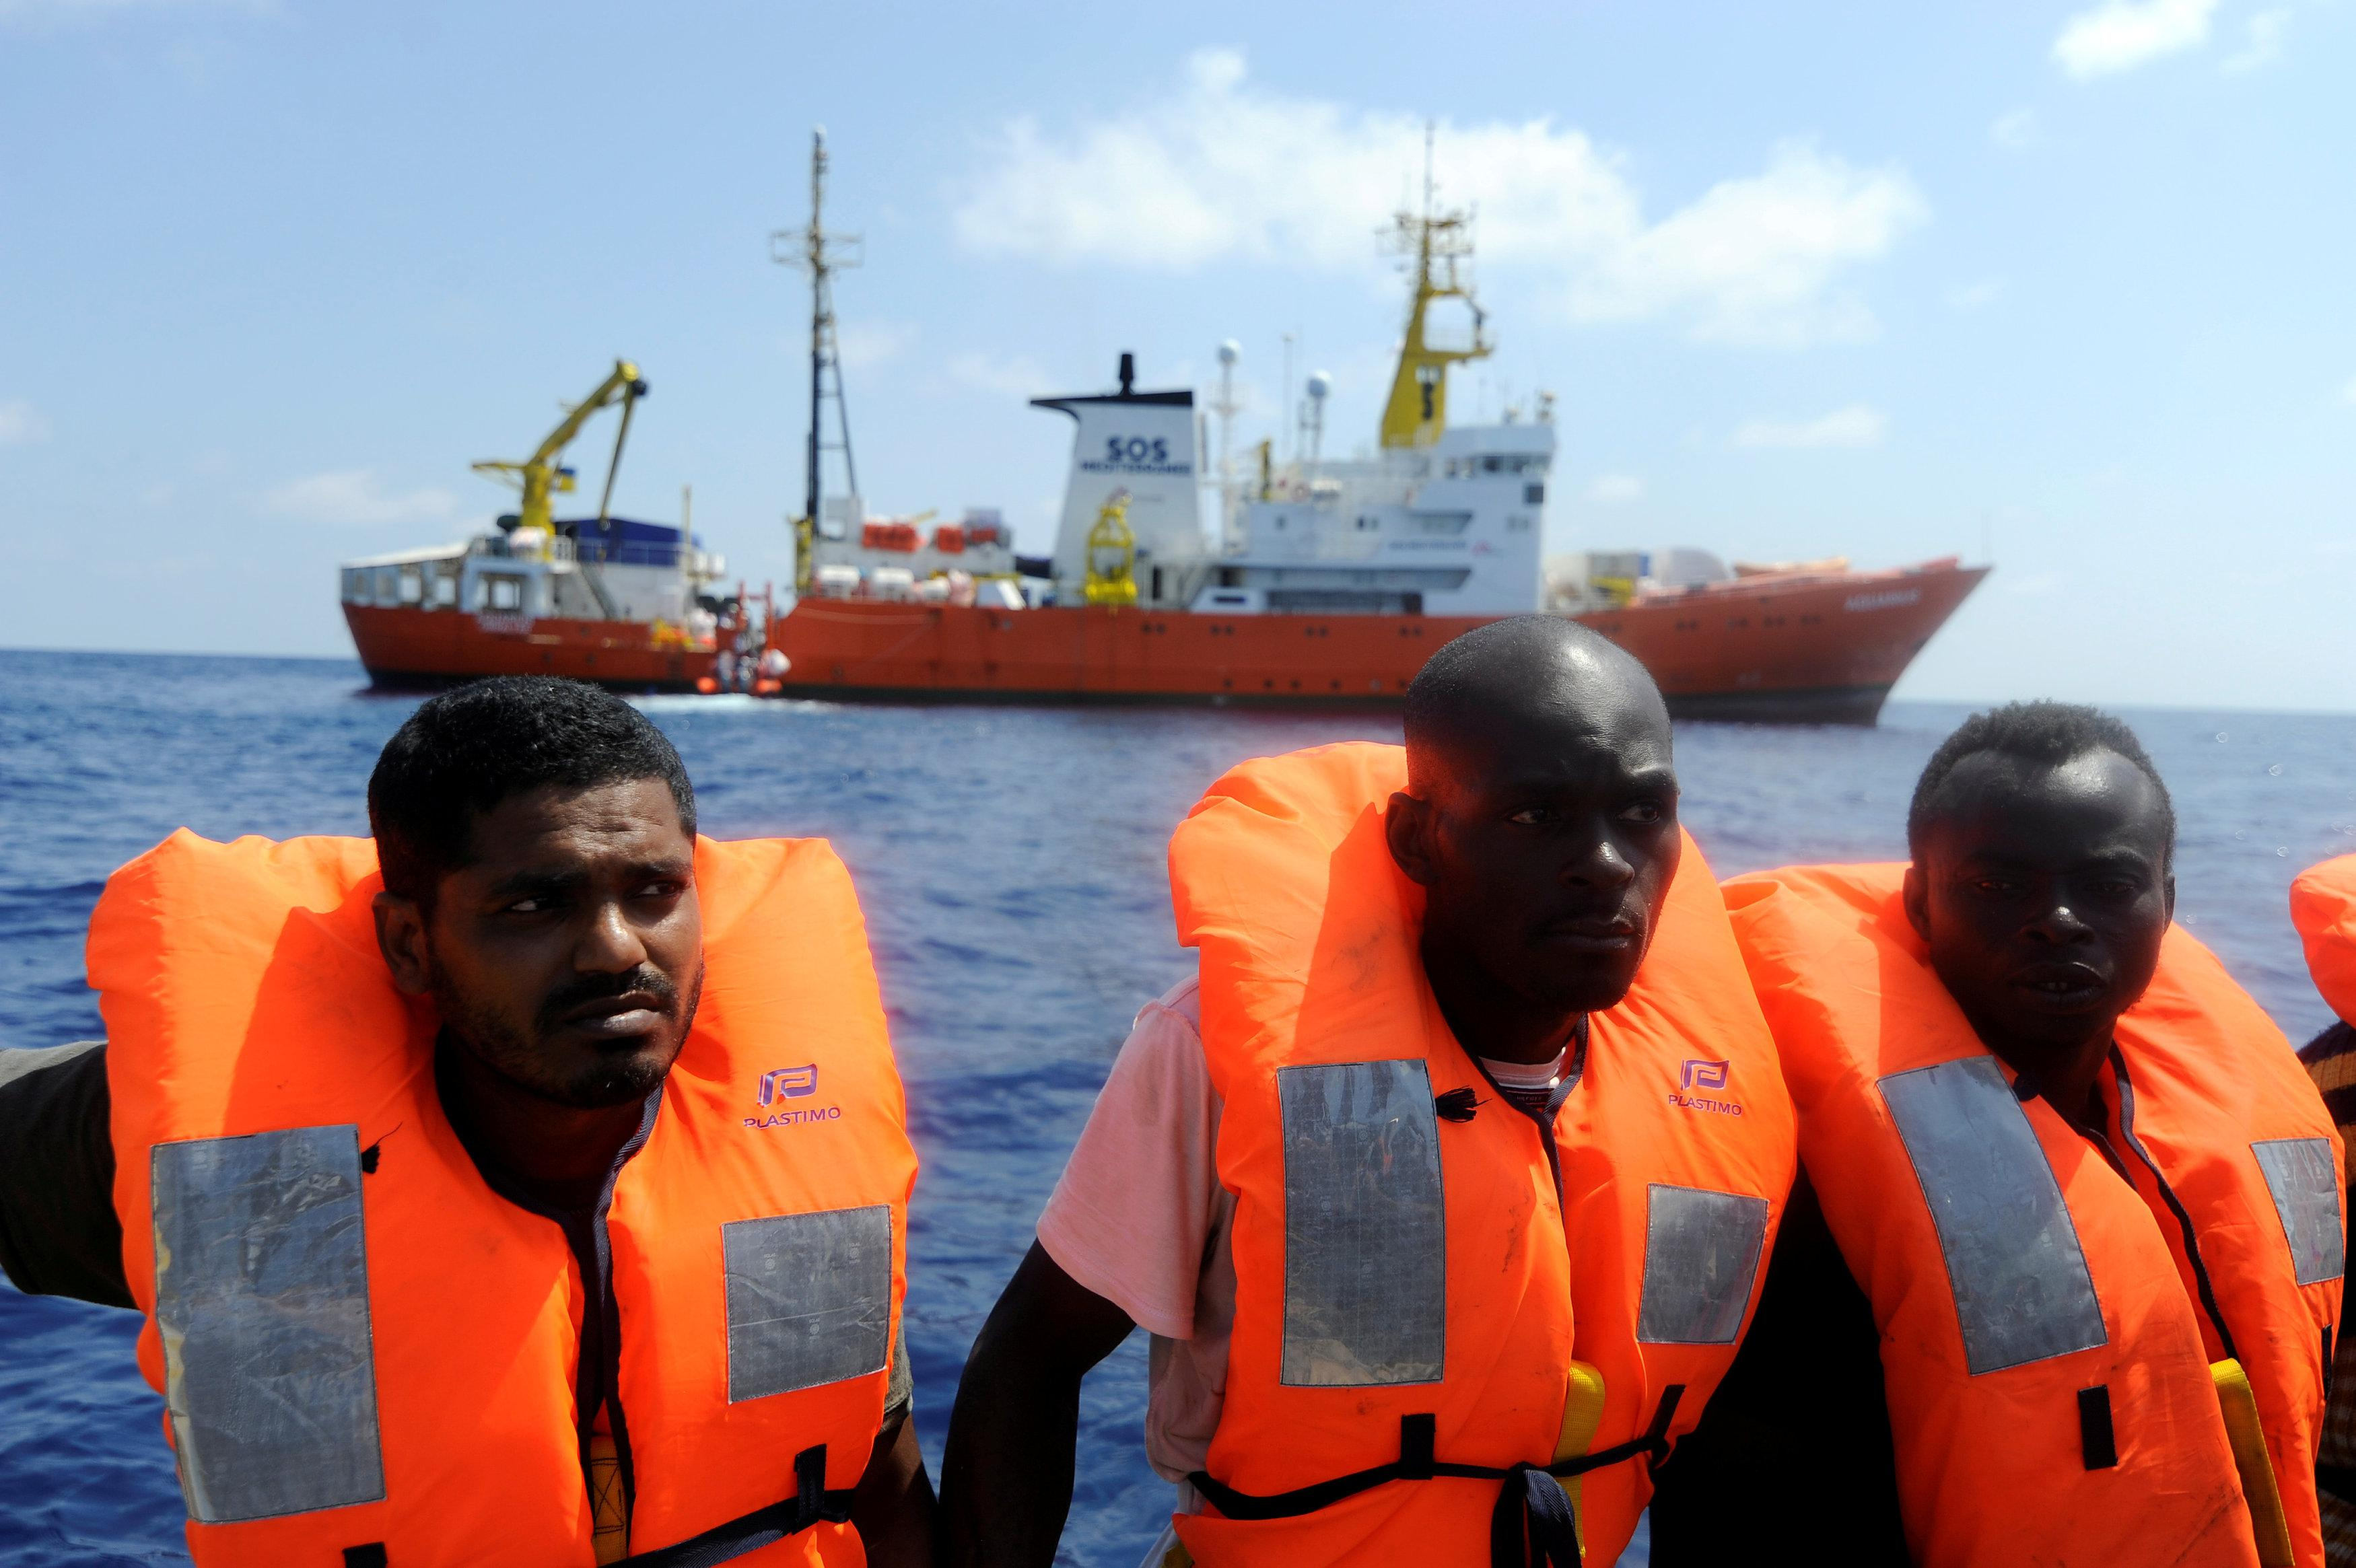 Panama revokes registration of last migrant rescue ship in